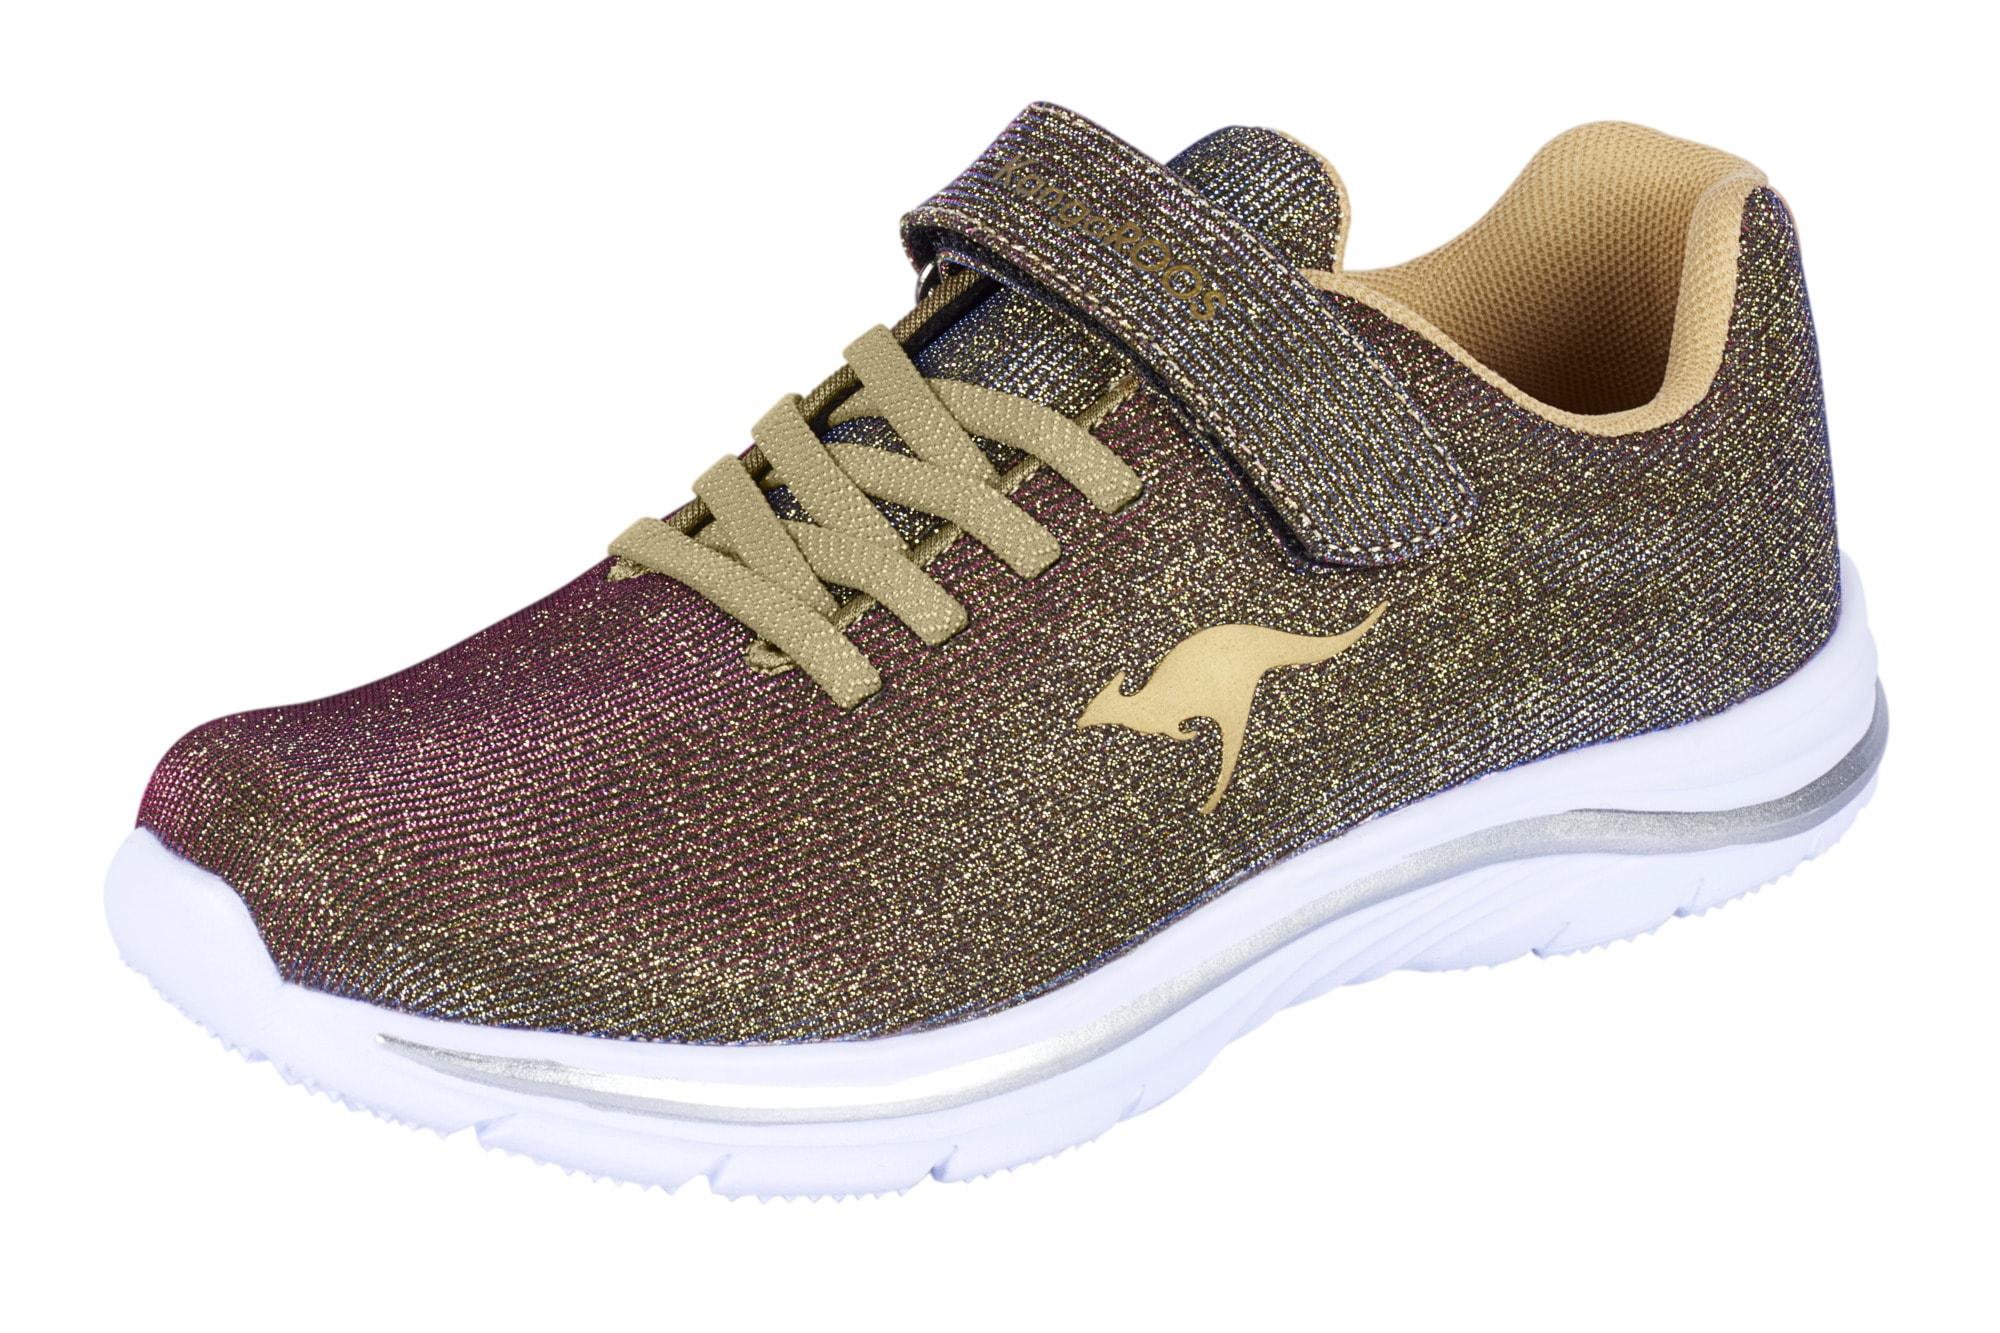 KangaROOS Sneaker , changierend günstig Preis-Leistungs-Verhältnis, online kaufen   Gutes Preis-Leistungs-Verhältnis, günstig es lohnt sich e00691